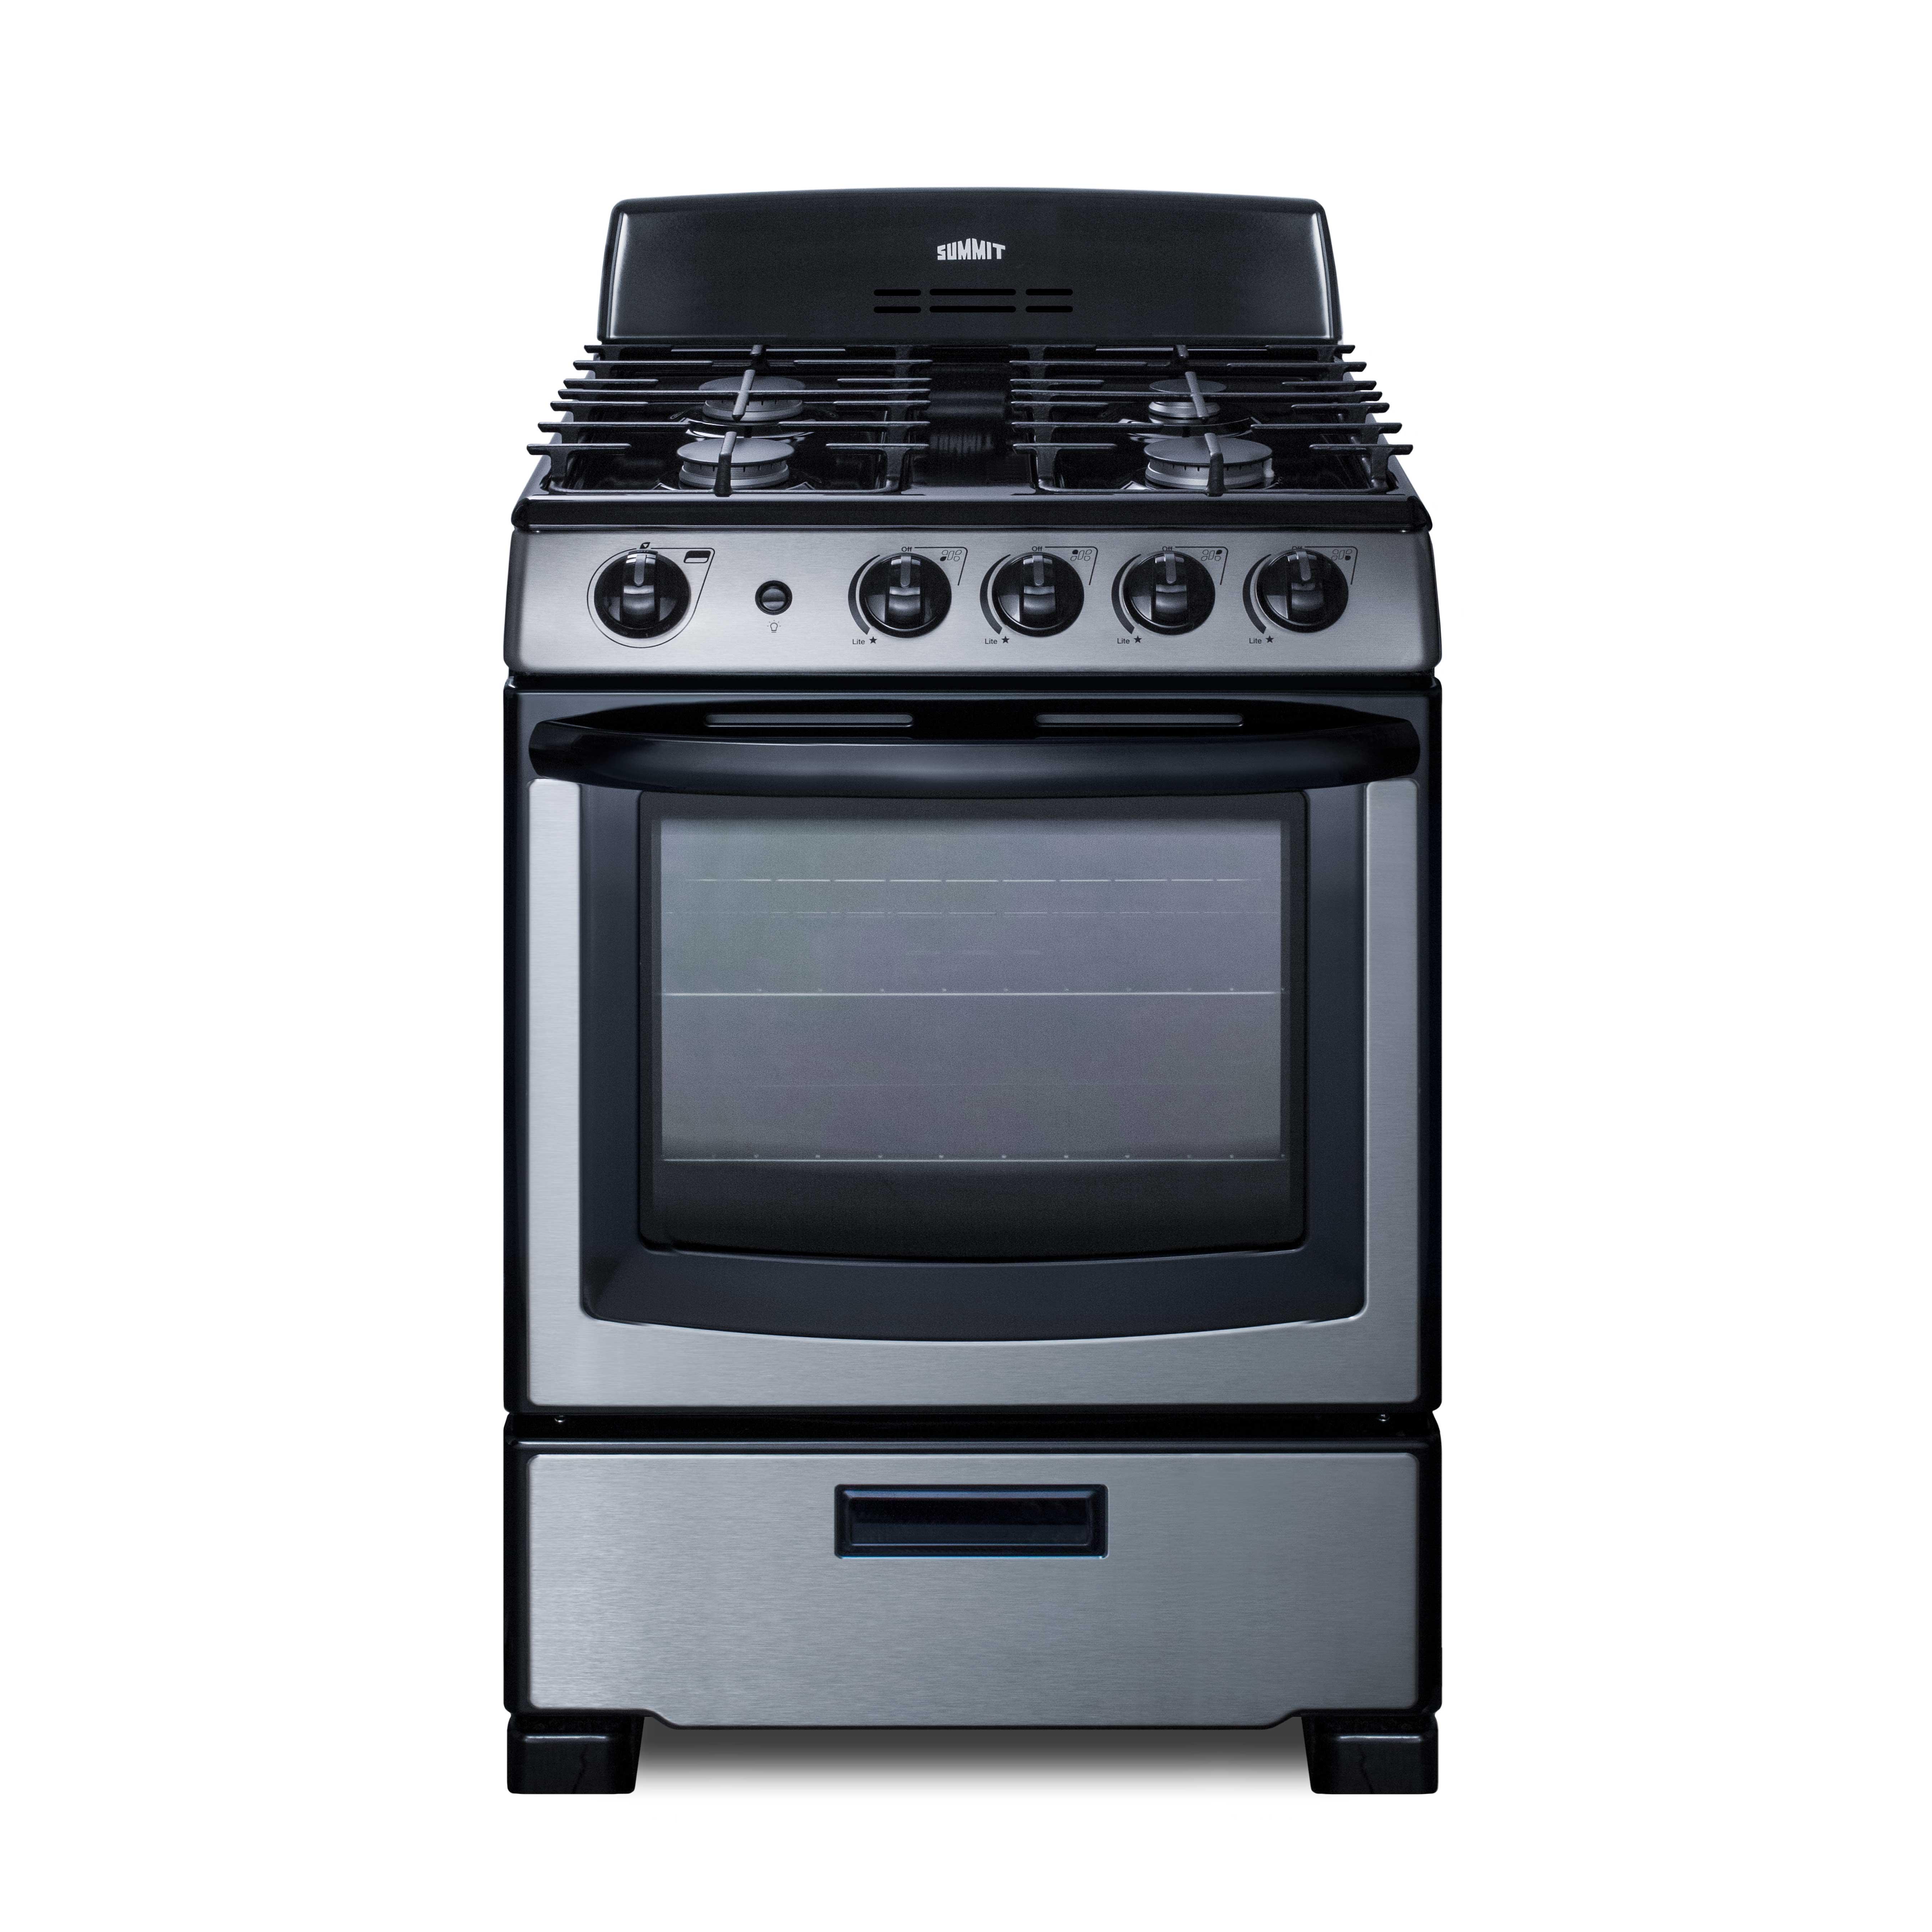 Summit Appliance PRO247SS range, residential domestic